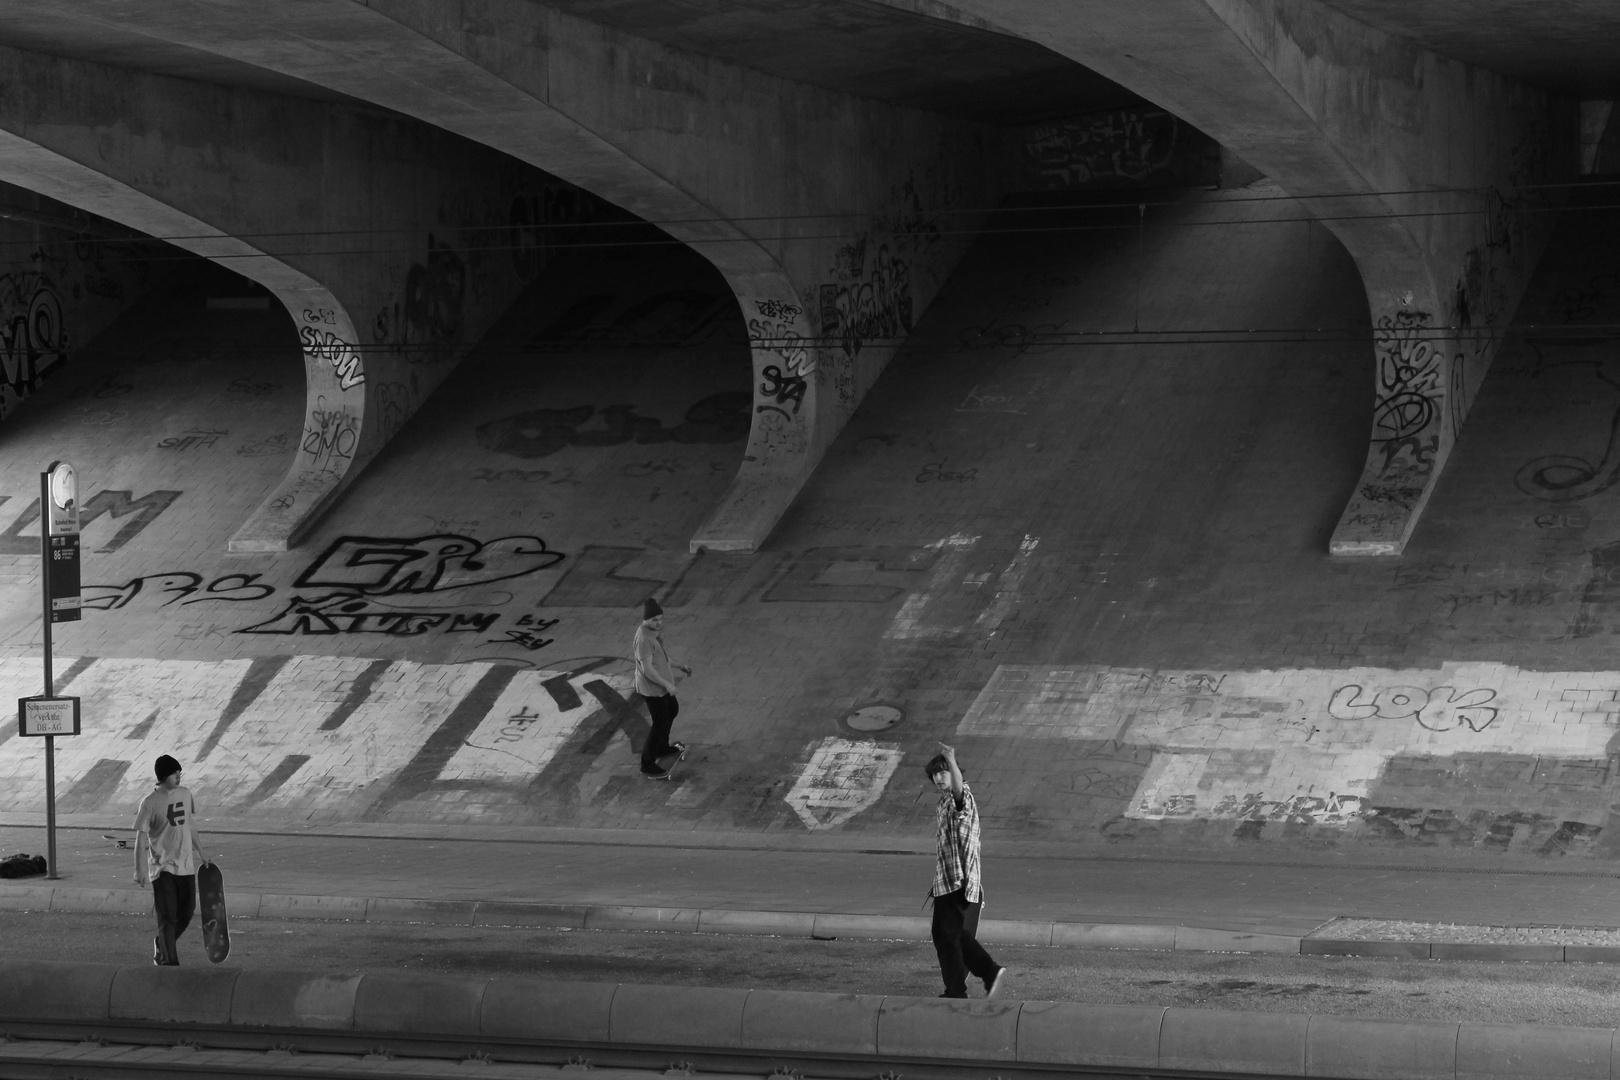 skateboarding underground